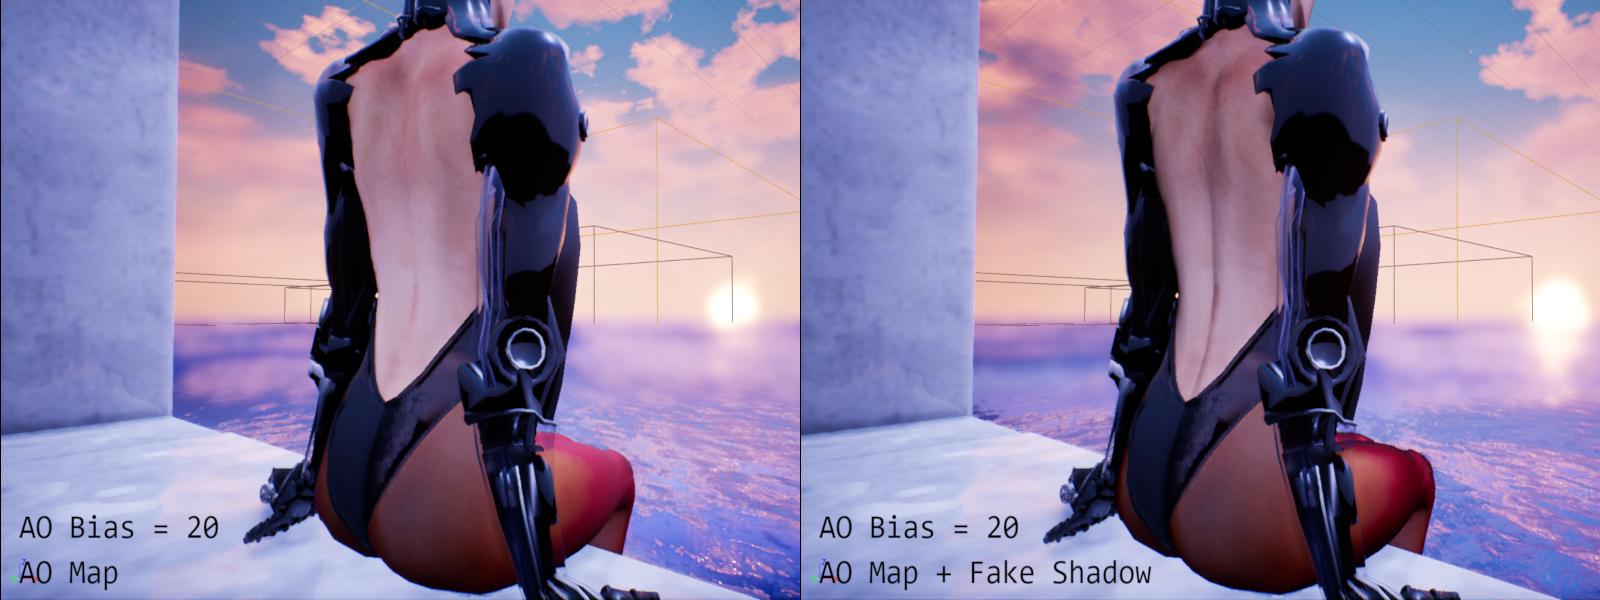 AO map plus fake shadow comparison